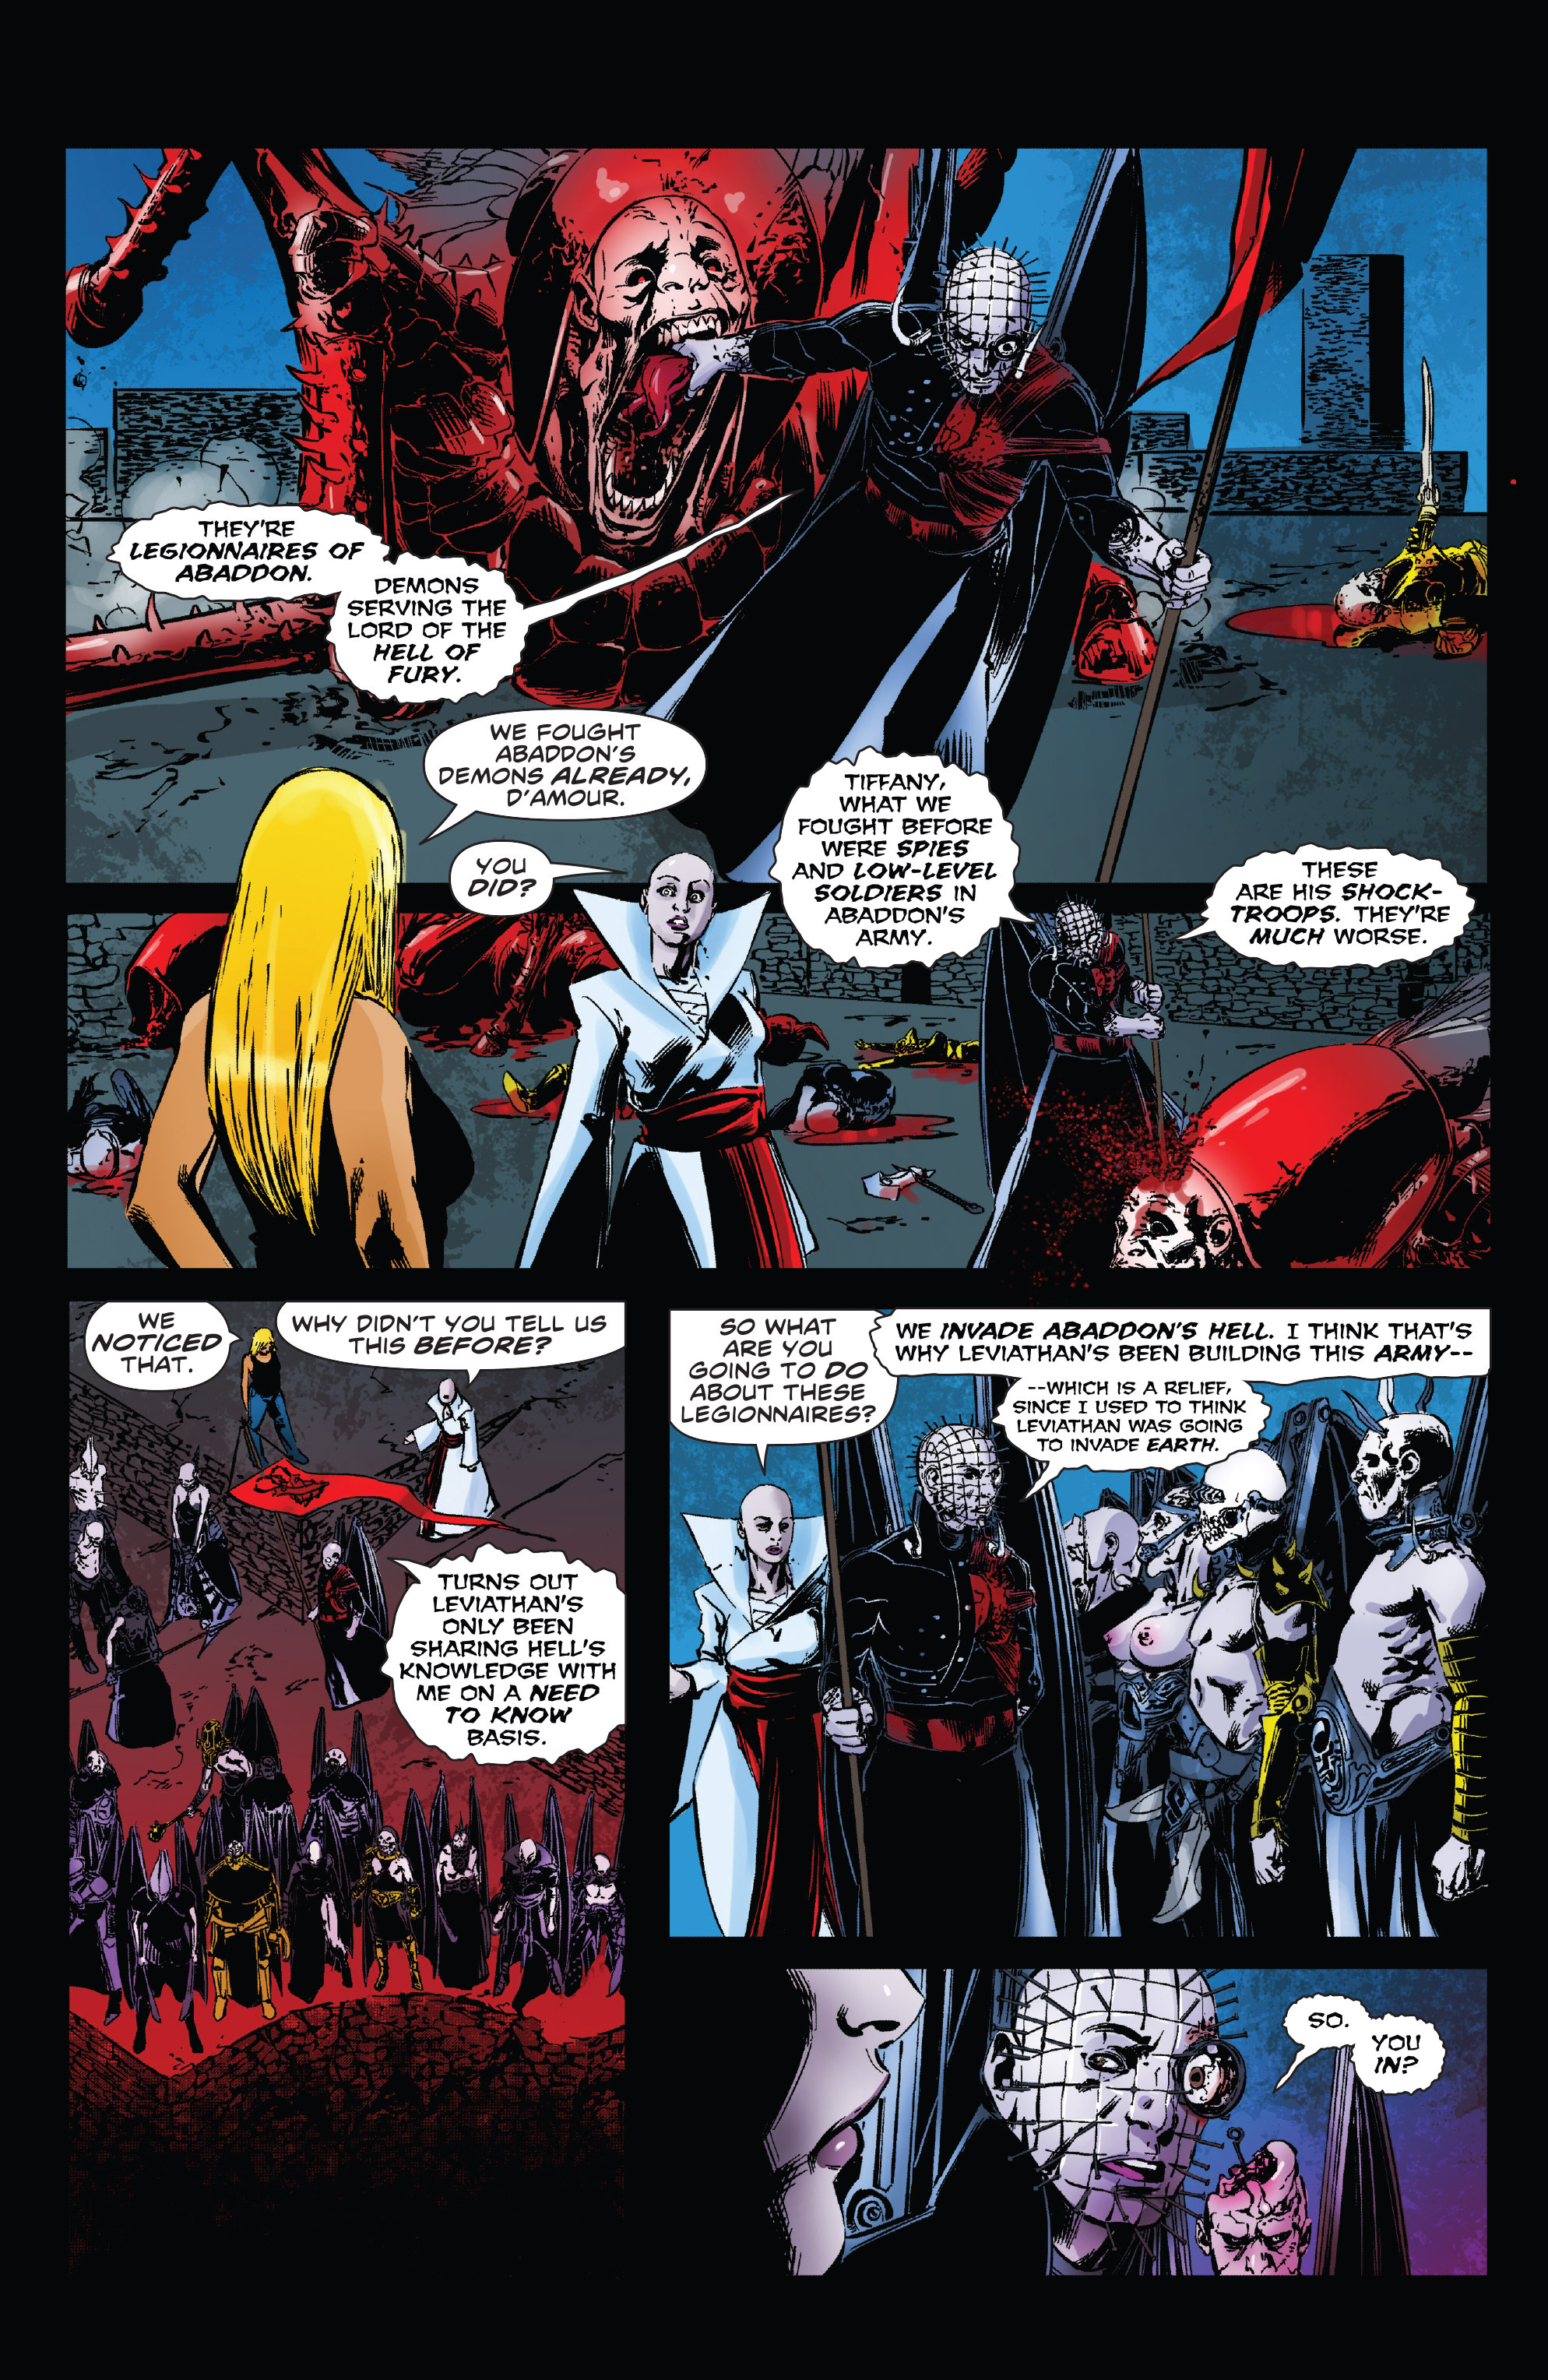 Read online Clive Barker's Hellraiser: The Dark Watch comic -  Issue # TPB 3 - 62